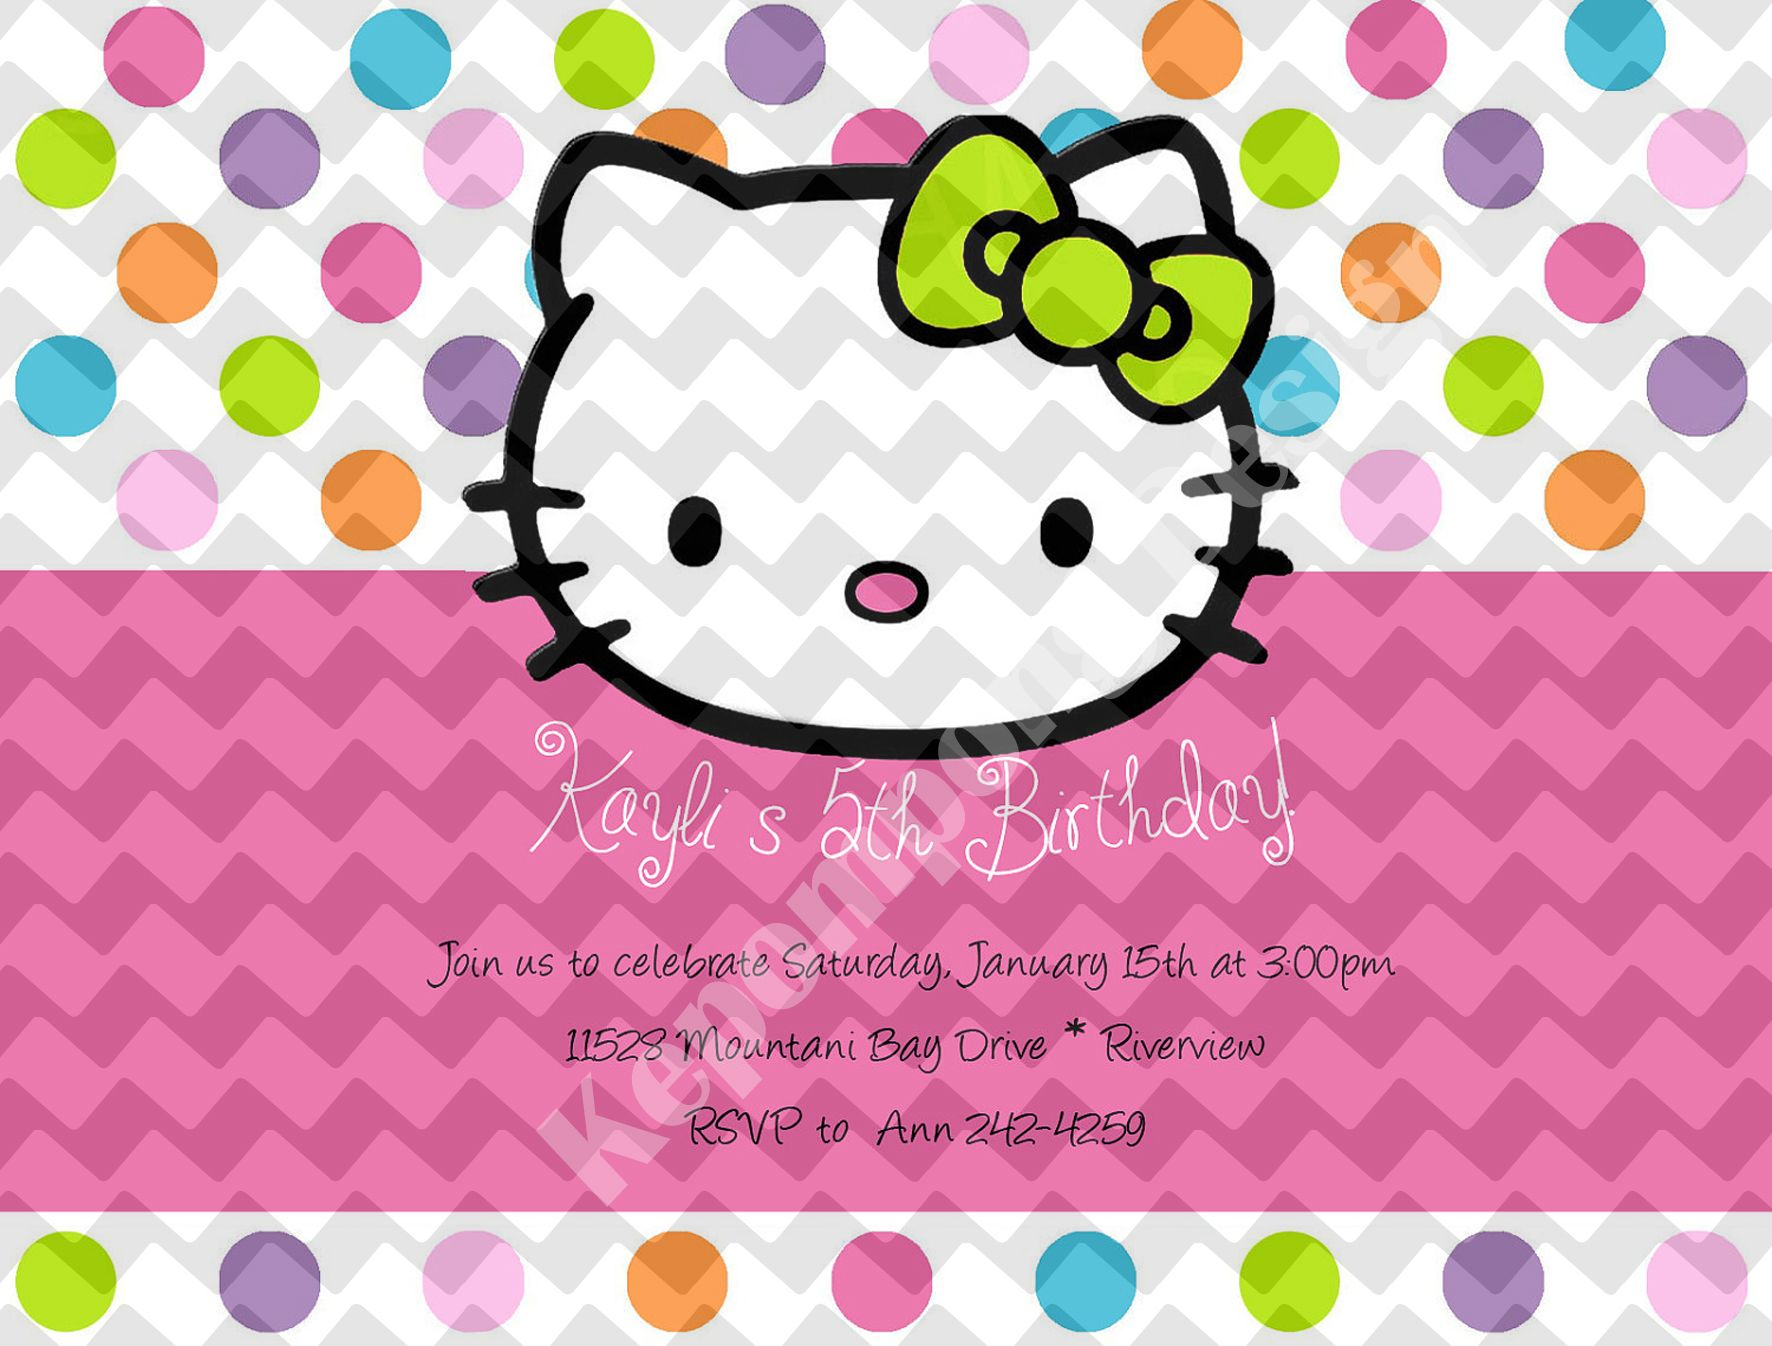 Hello kitty 2 birthday invitation card kartu undangan ulang tahun hello kitty 2 birthday invitation card kartu undangan ulang tahun ukuran 15 x 10 cm kertas stopboris Image collections